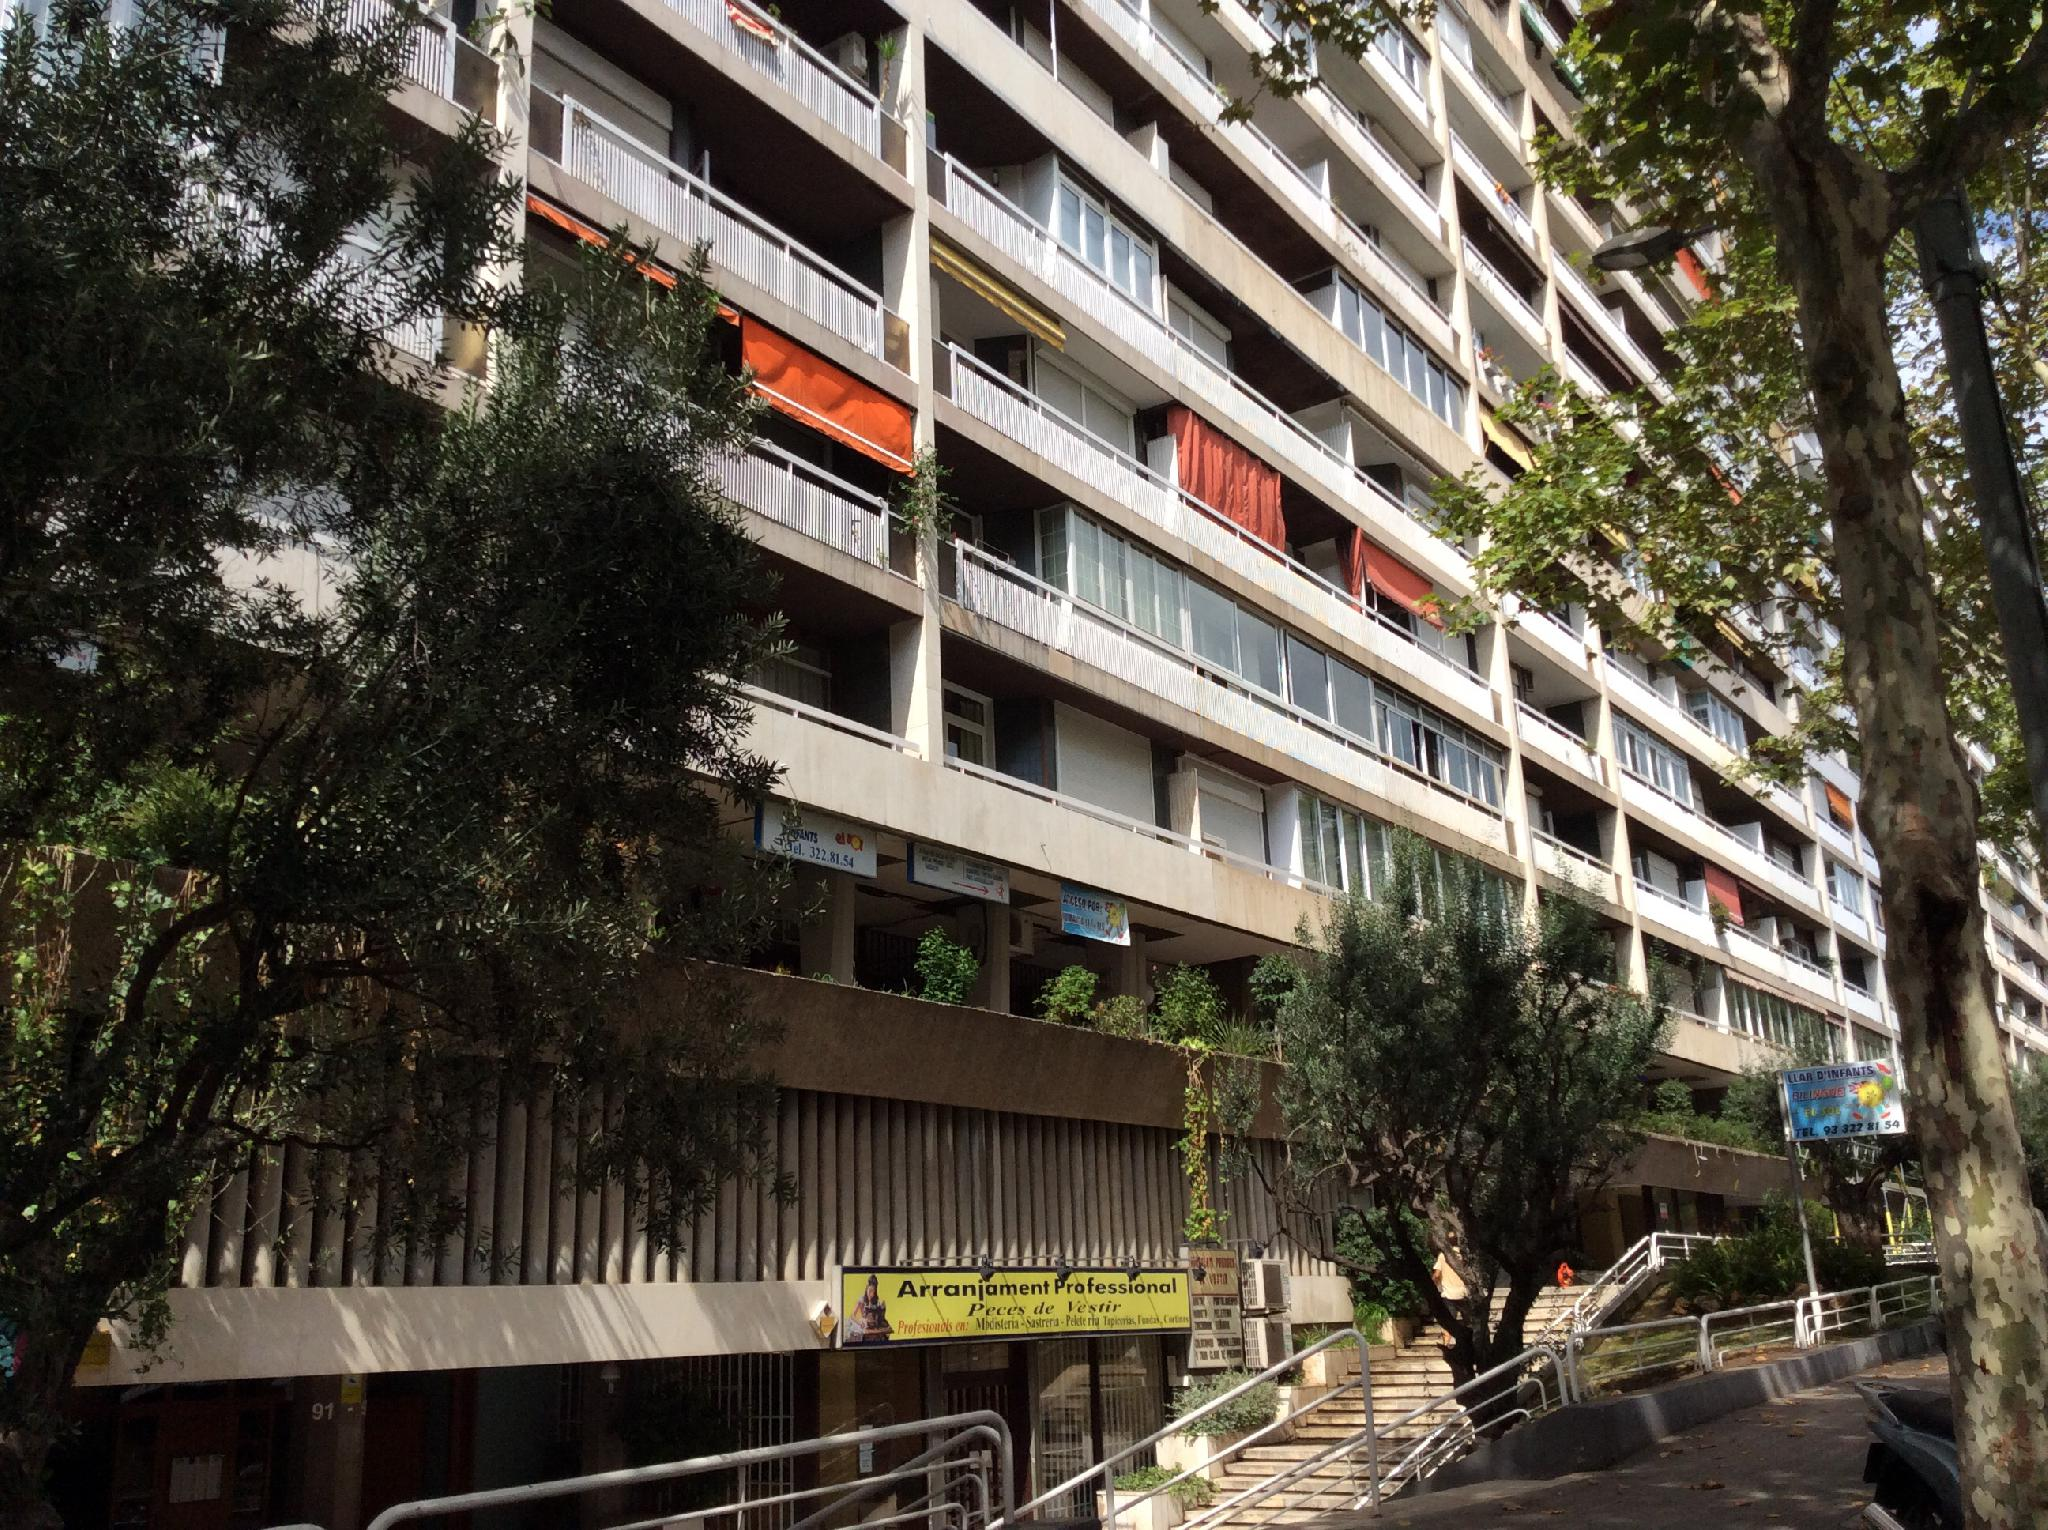 petit-appartement-de-vente-a-junto-travesera-de-las-corts-les-corts-a-barcelona-210269549